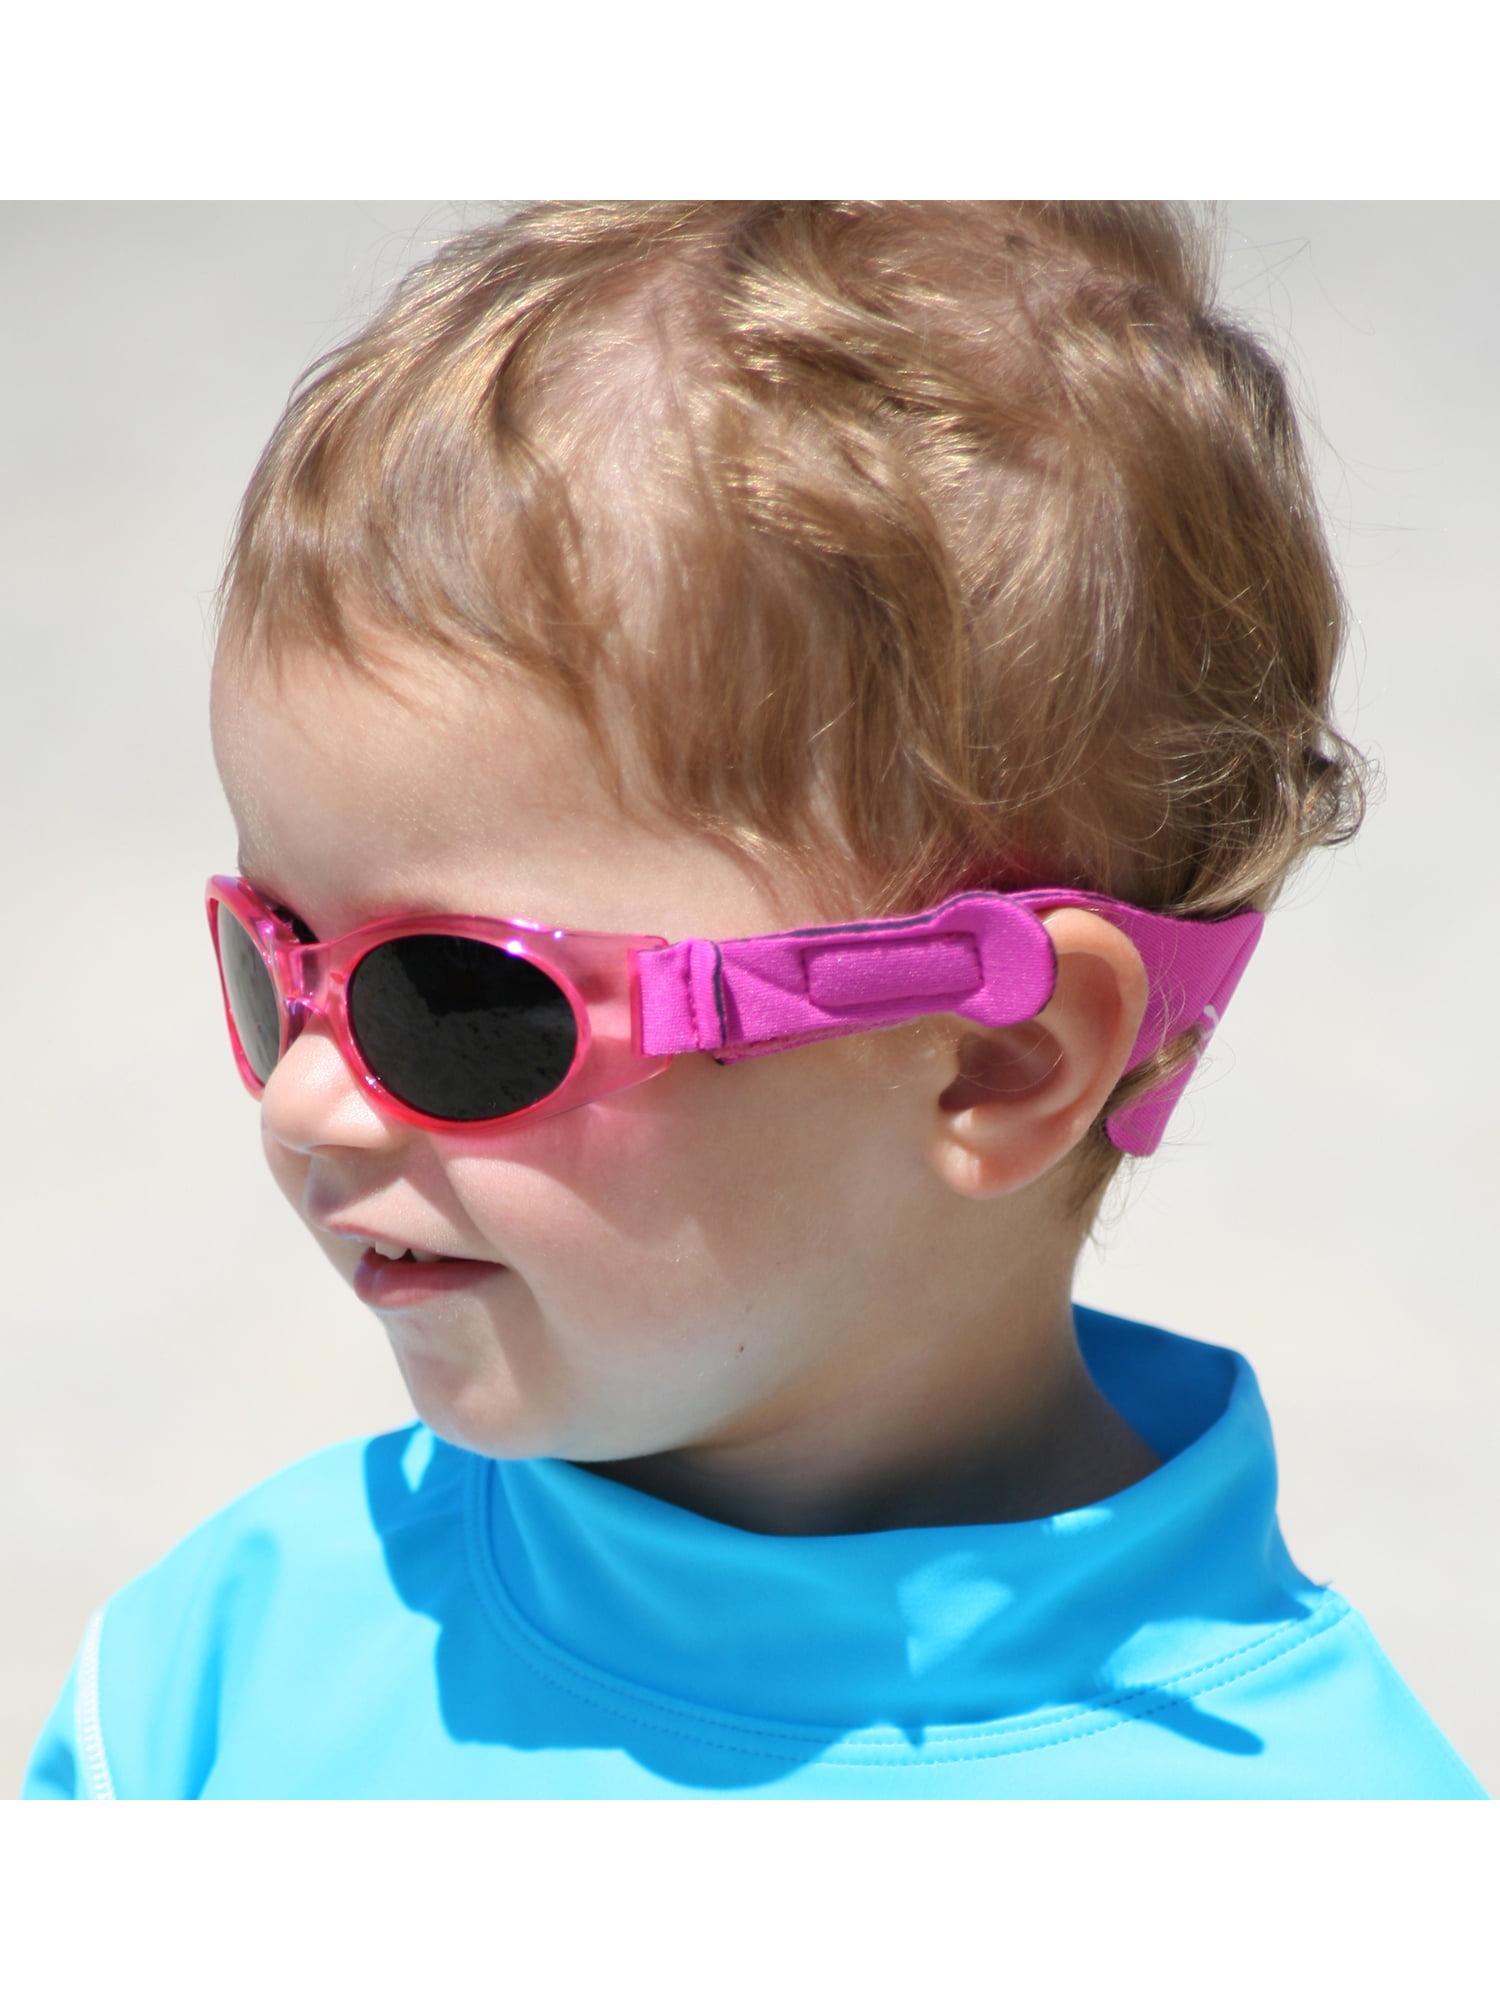 5c6dd8a9aa97 Tuga - Tuga Polarized Baby   Toddler UV 400 Sunglasses w  2 Straps   Case